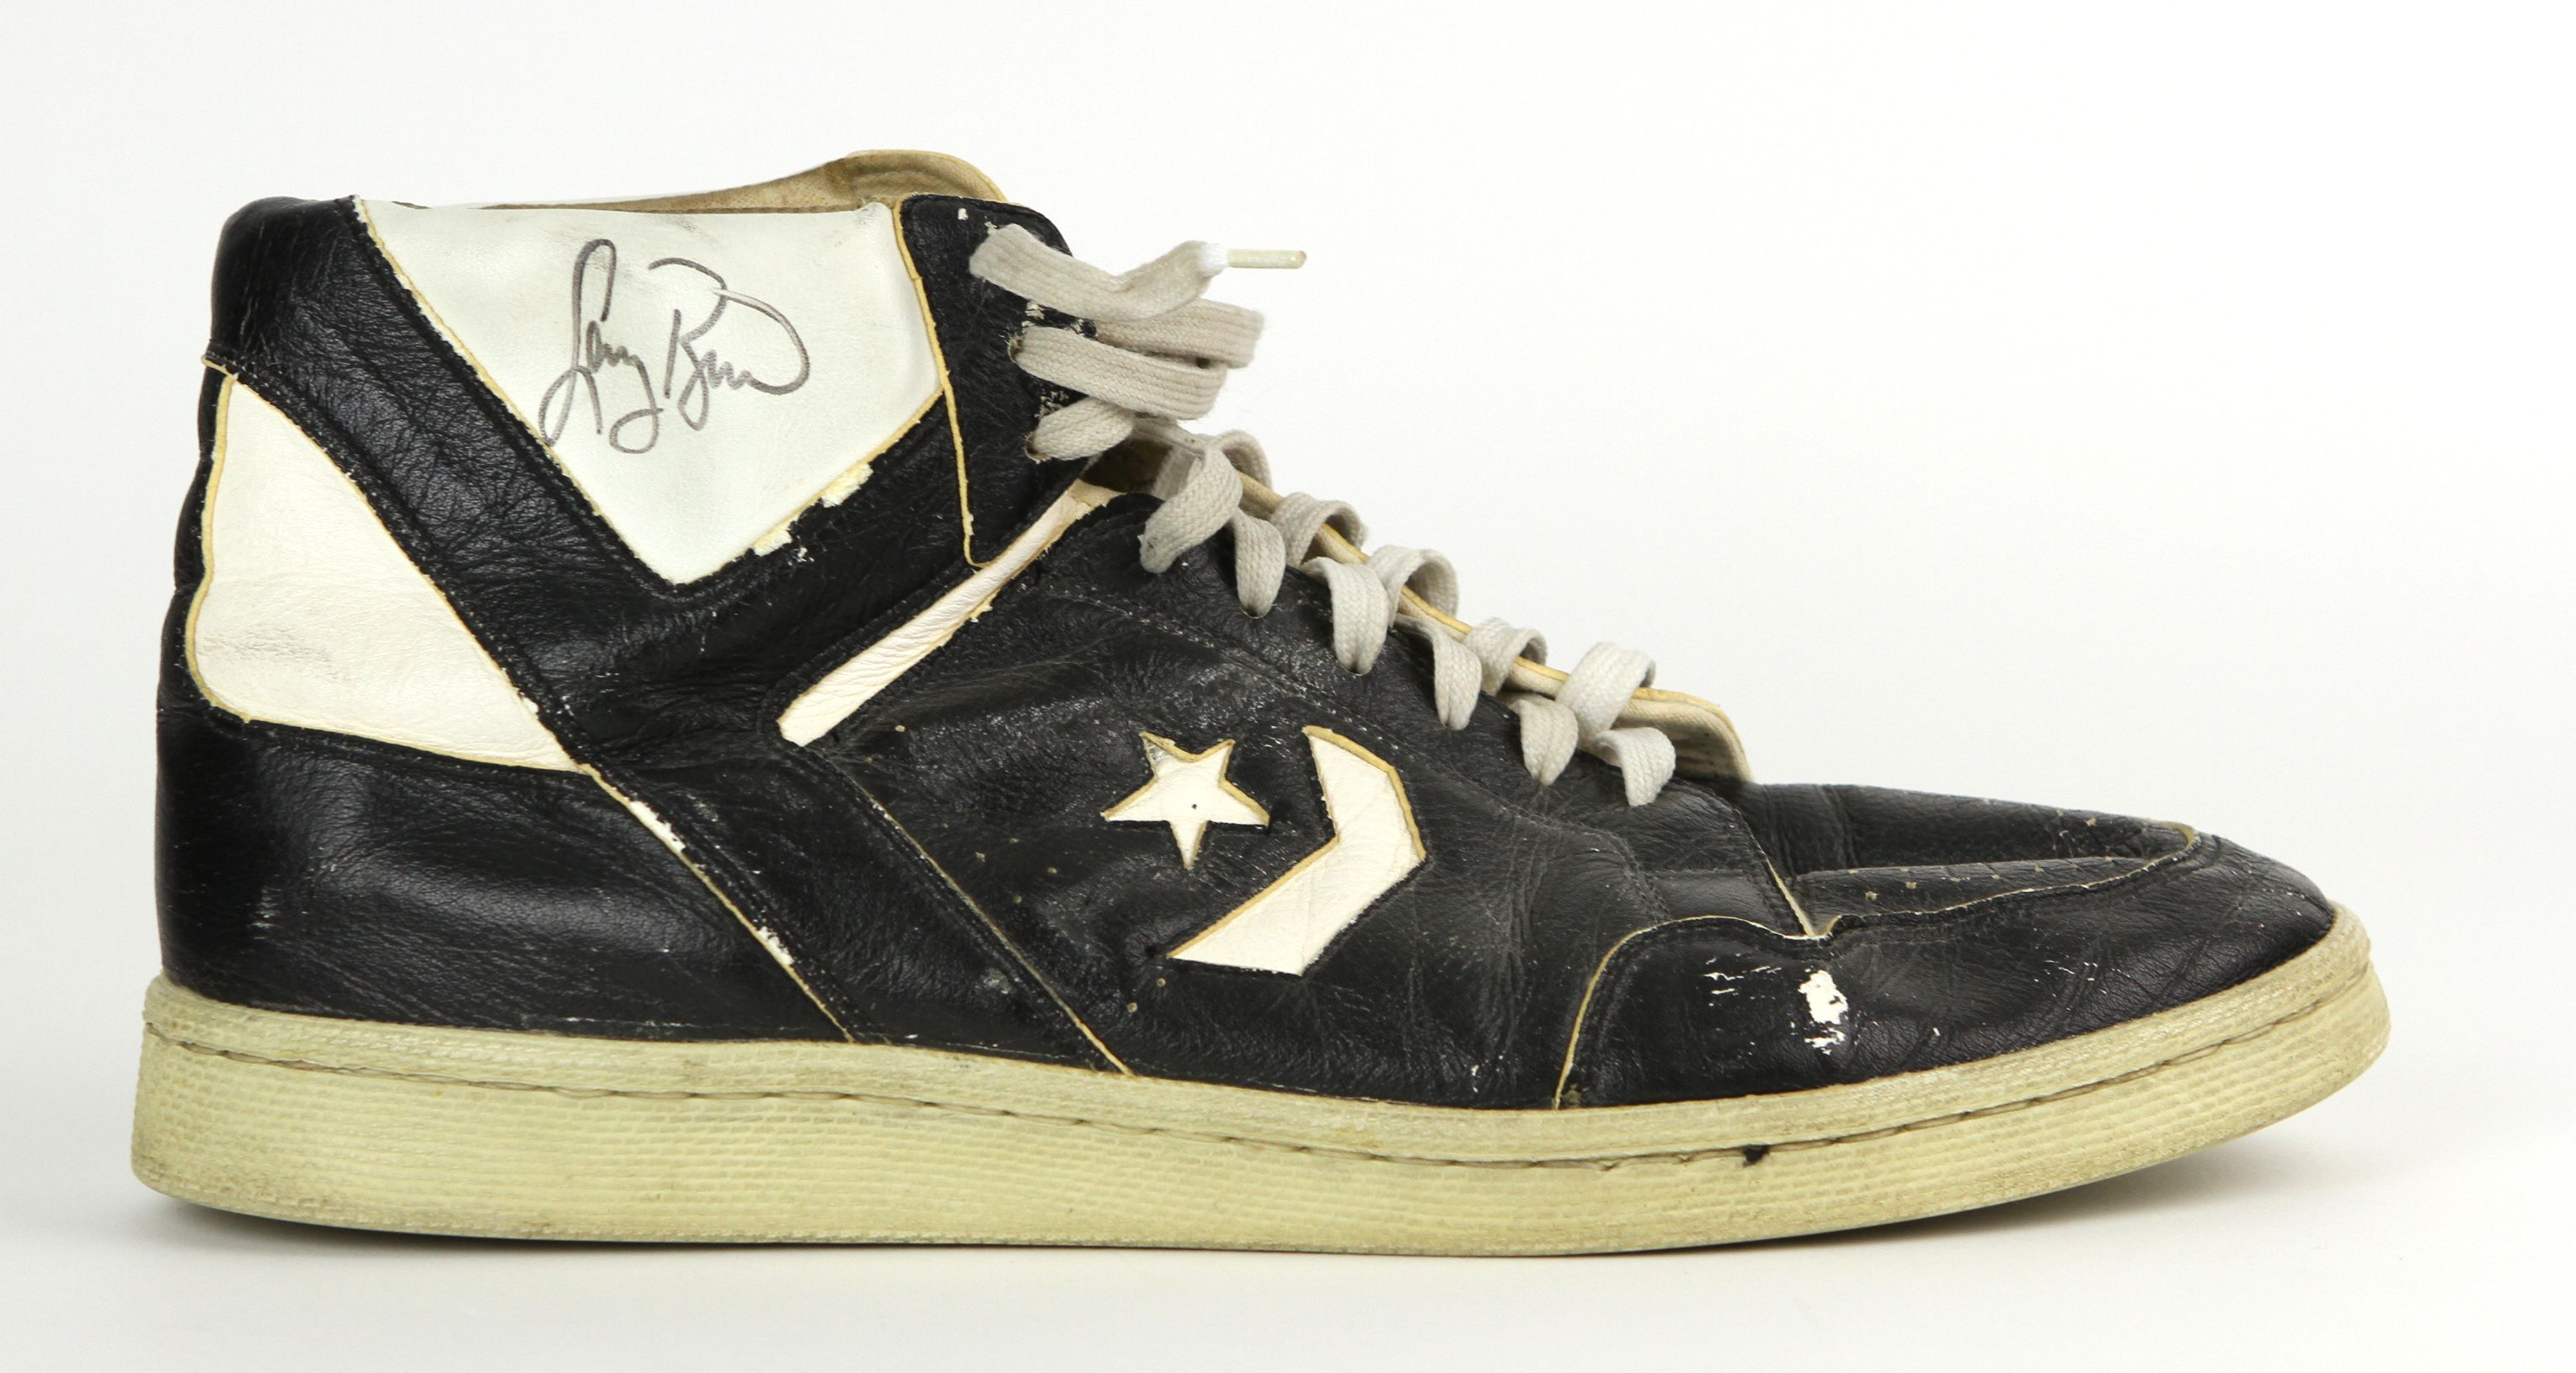 847be8ca3e9 Lot Detail - 1986-90 circa Larry Bird Boston Celtics Single Signed ...